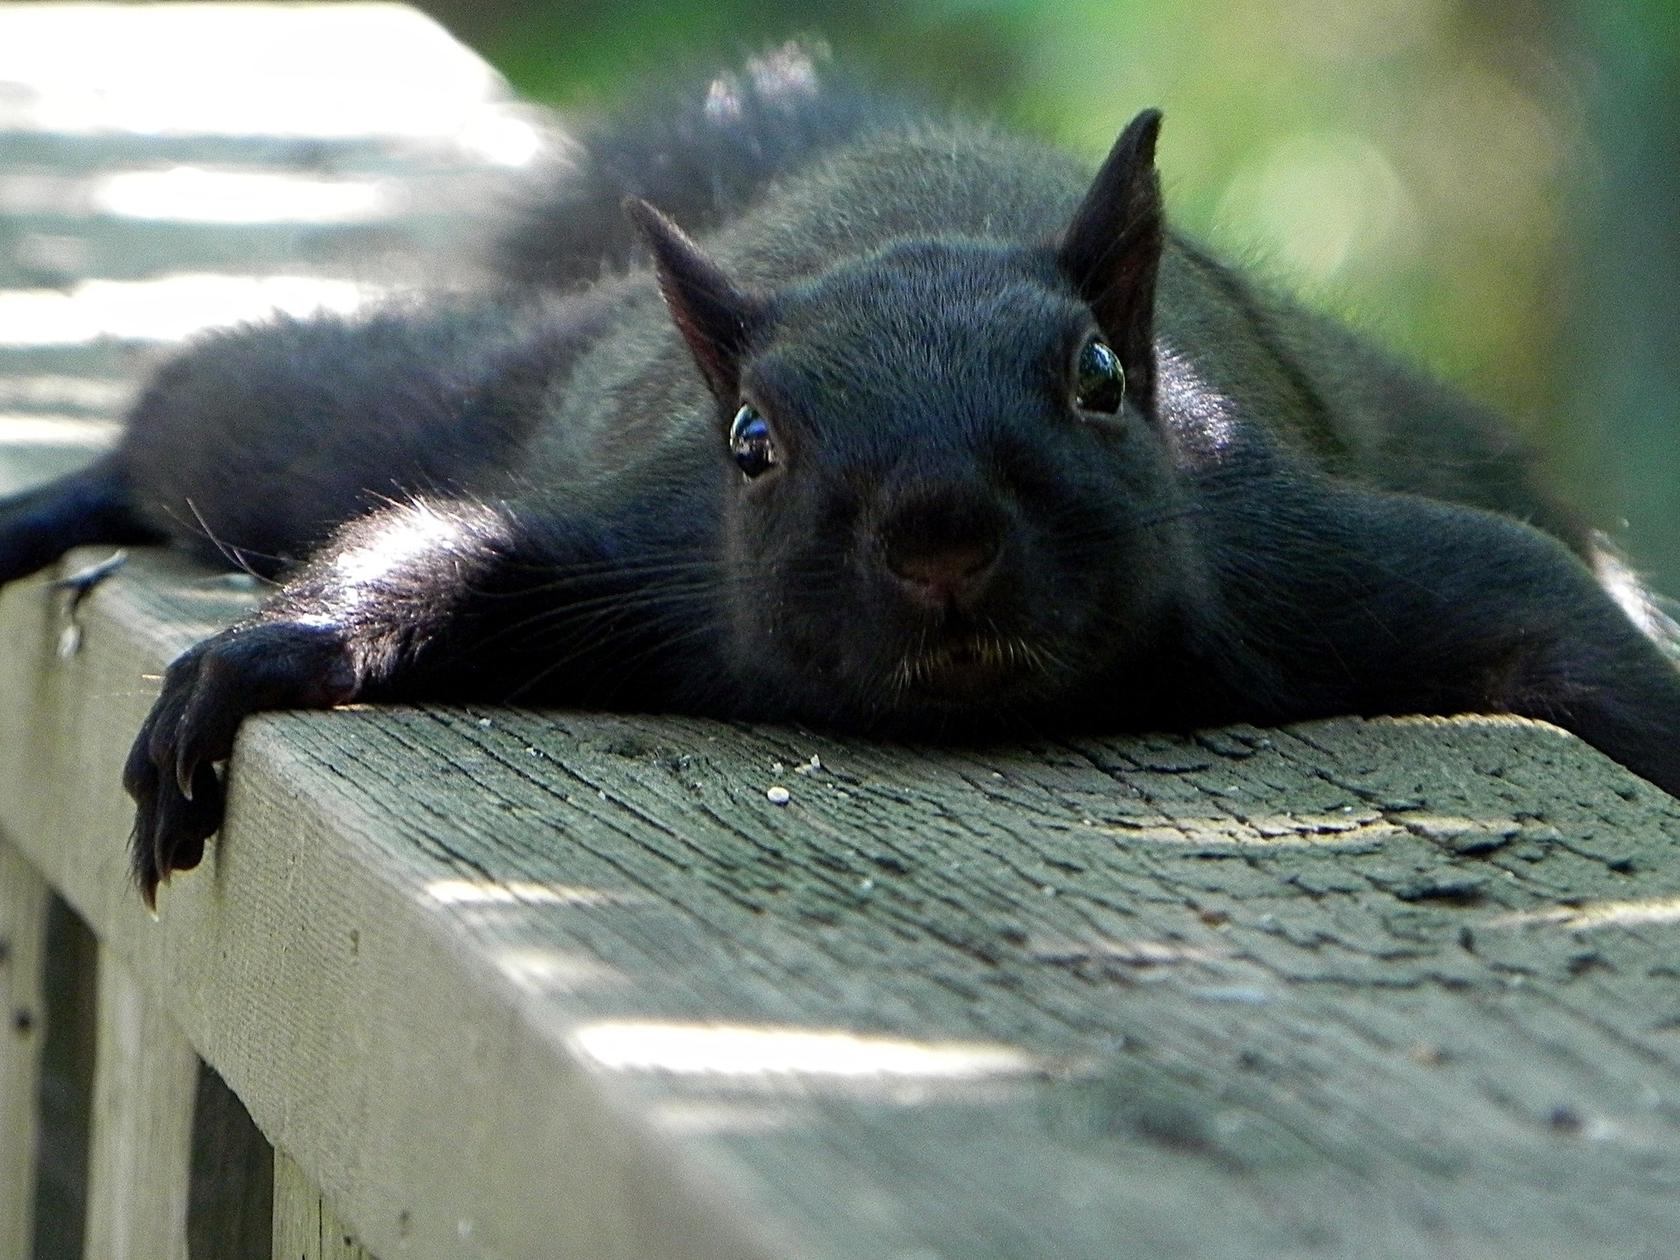 Animals funny squirrels (1680x1260)